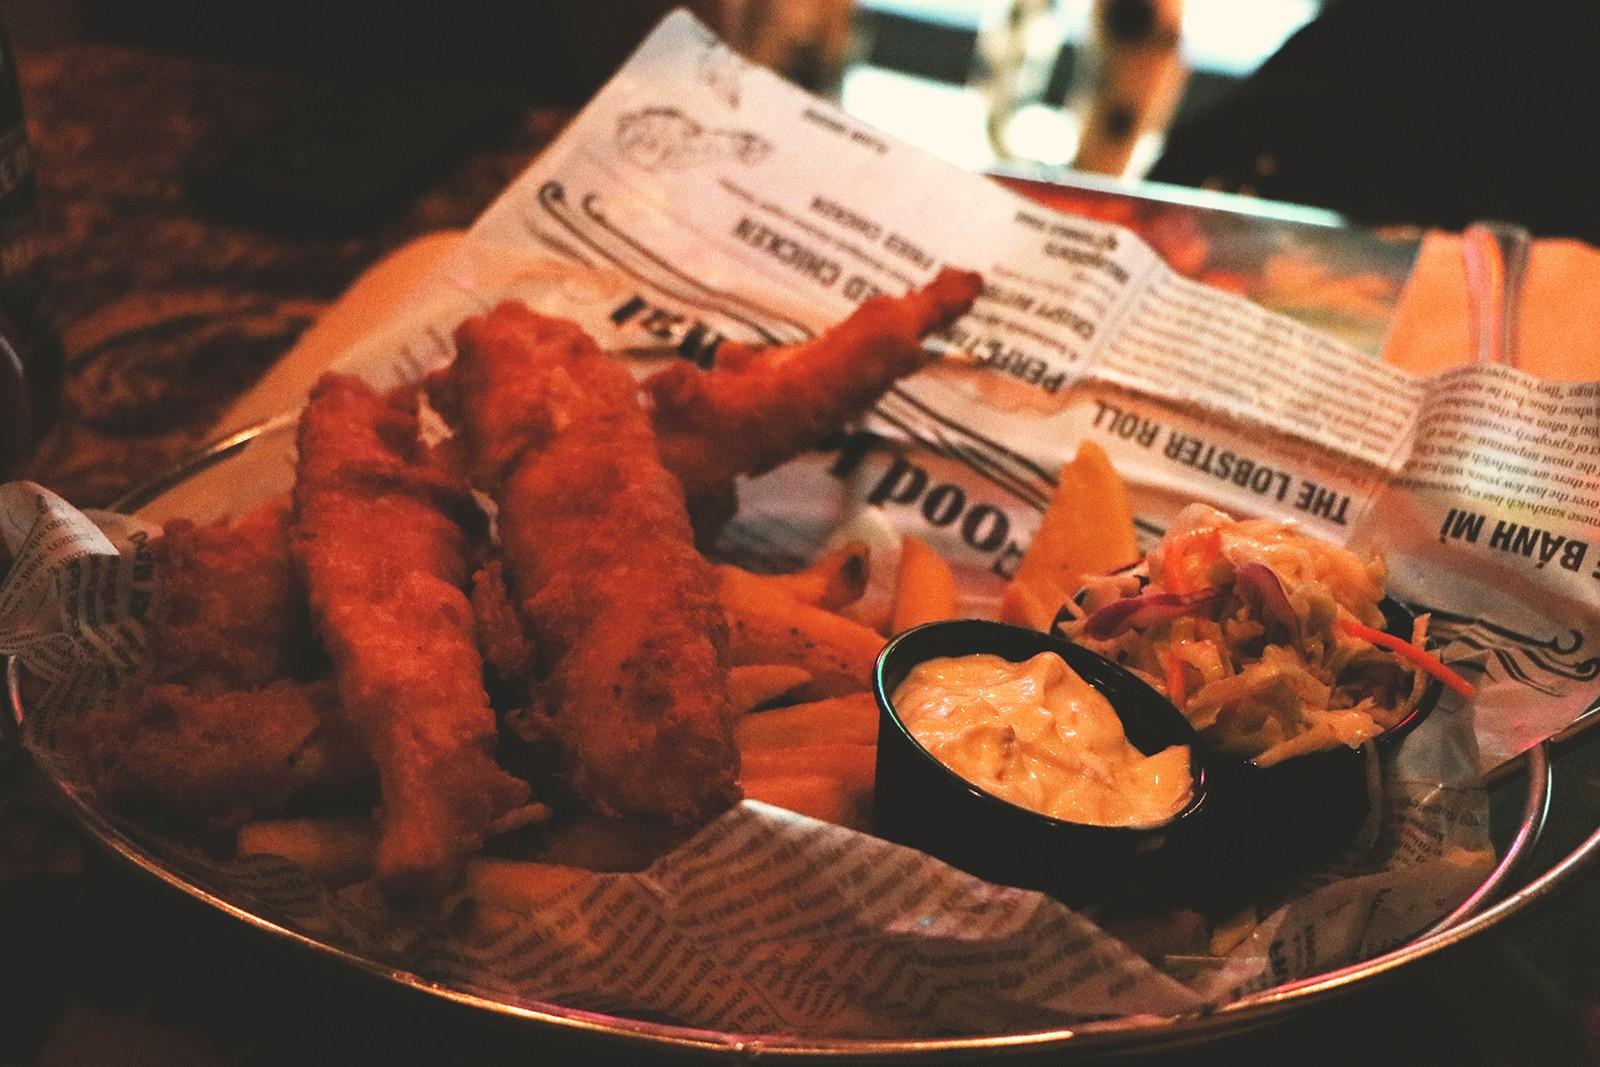 prato peixe e batatas fritas